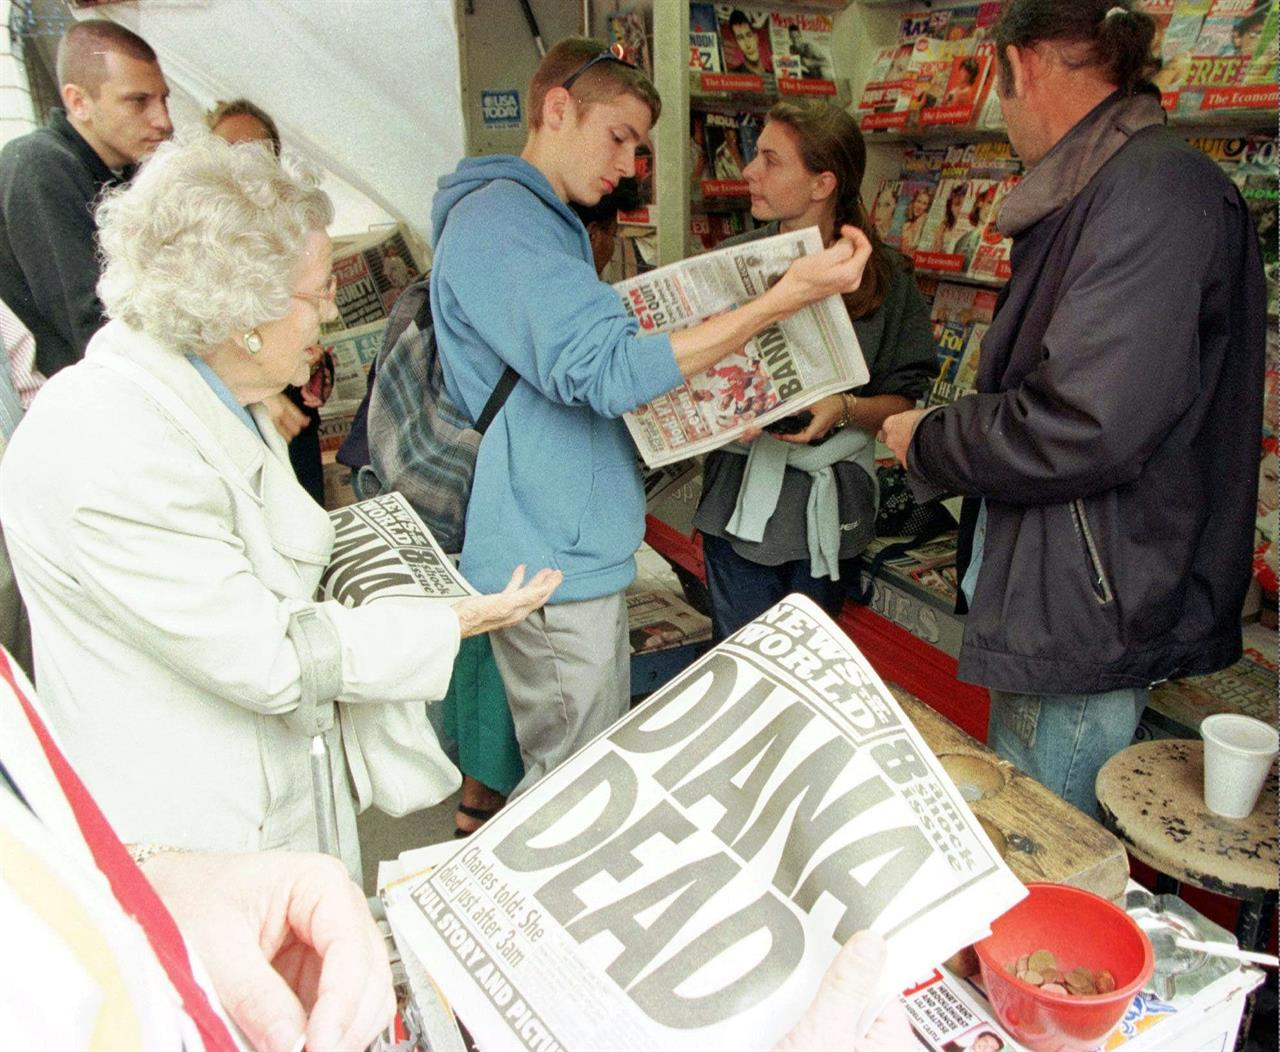 AP Was There: Princess Diana dies in Paris car crash | The